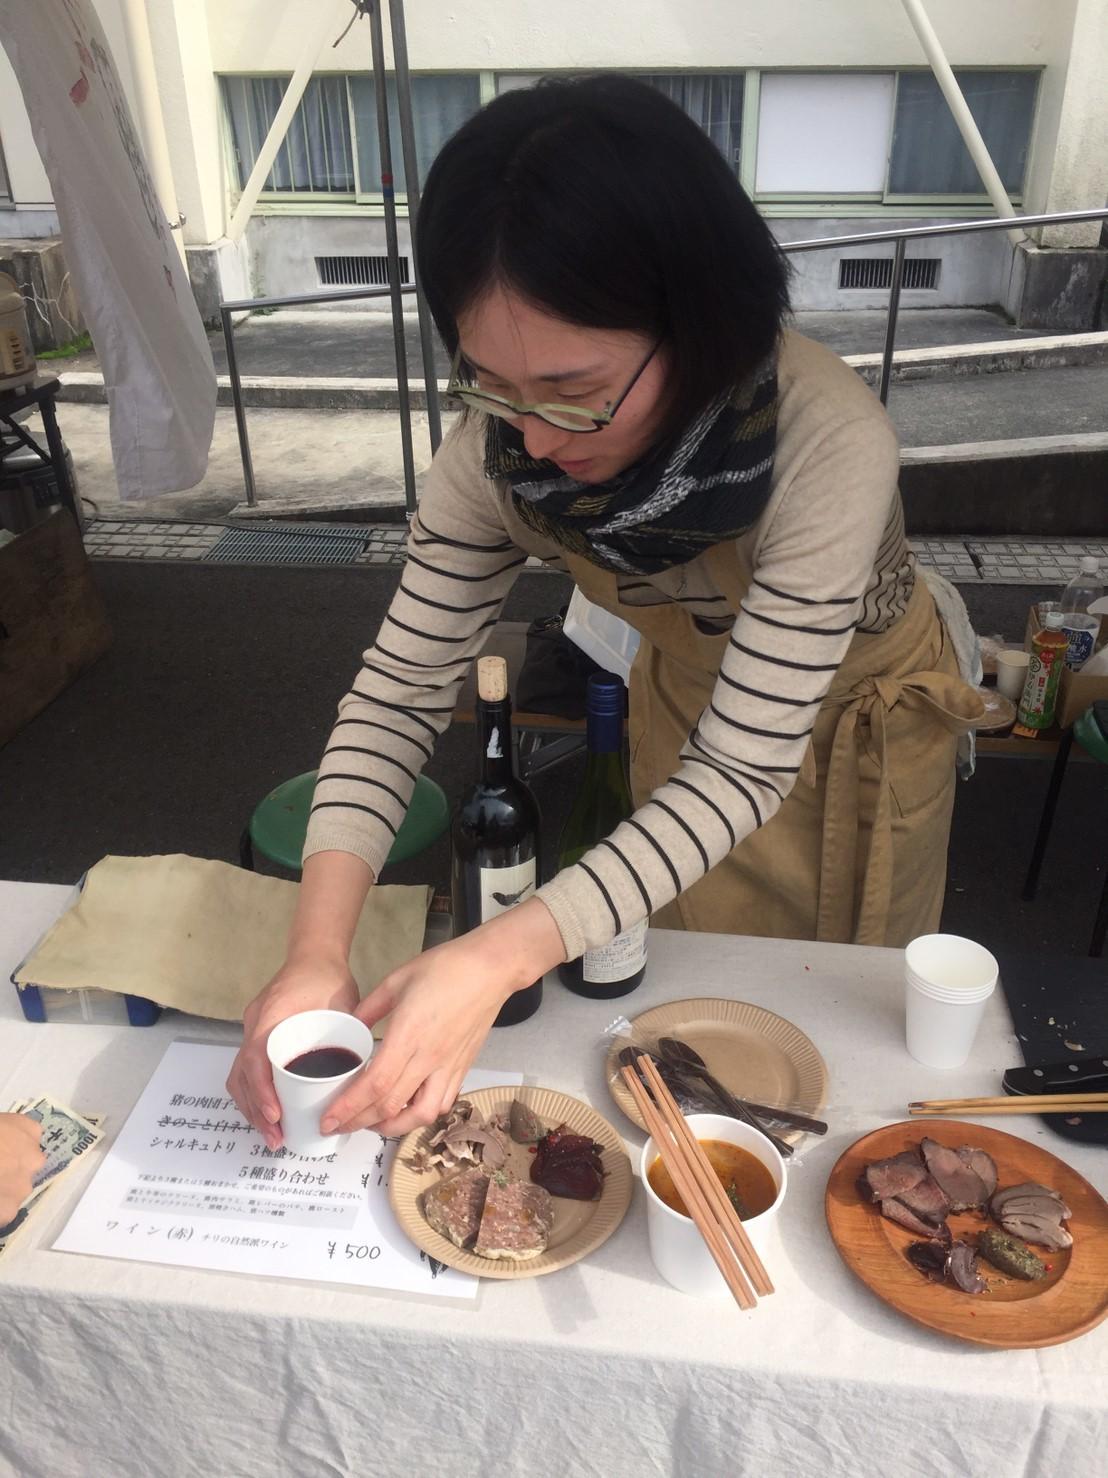 西郷工芸祭り・三滝渓_e0115904_15203120.jpg